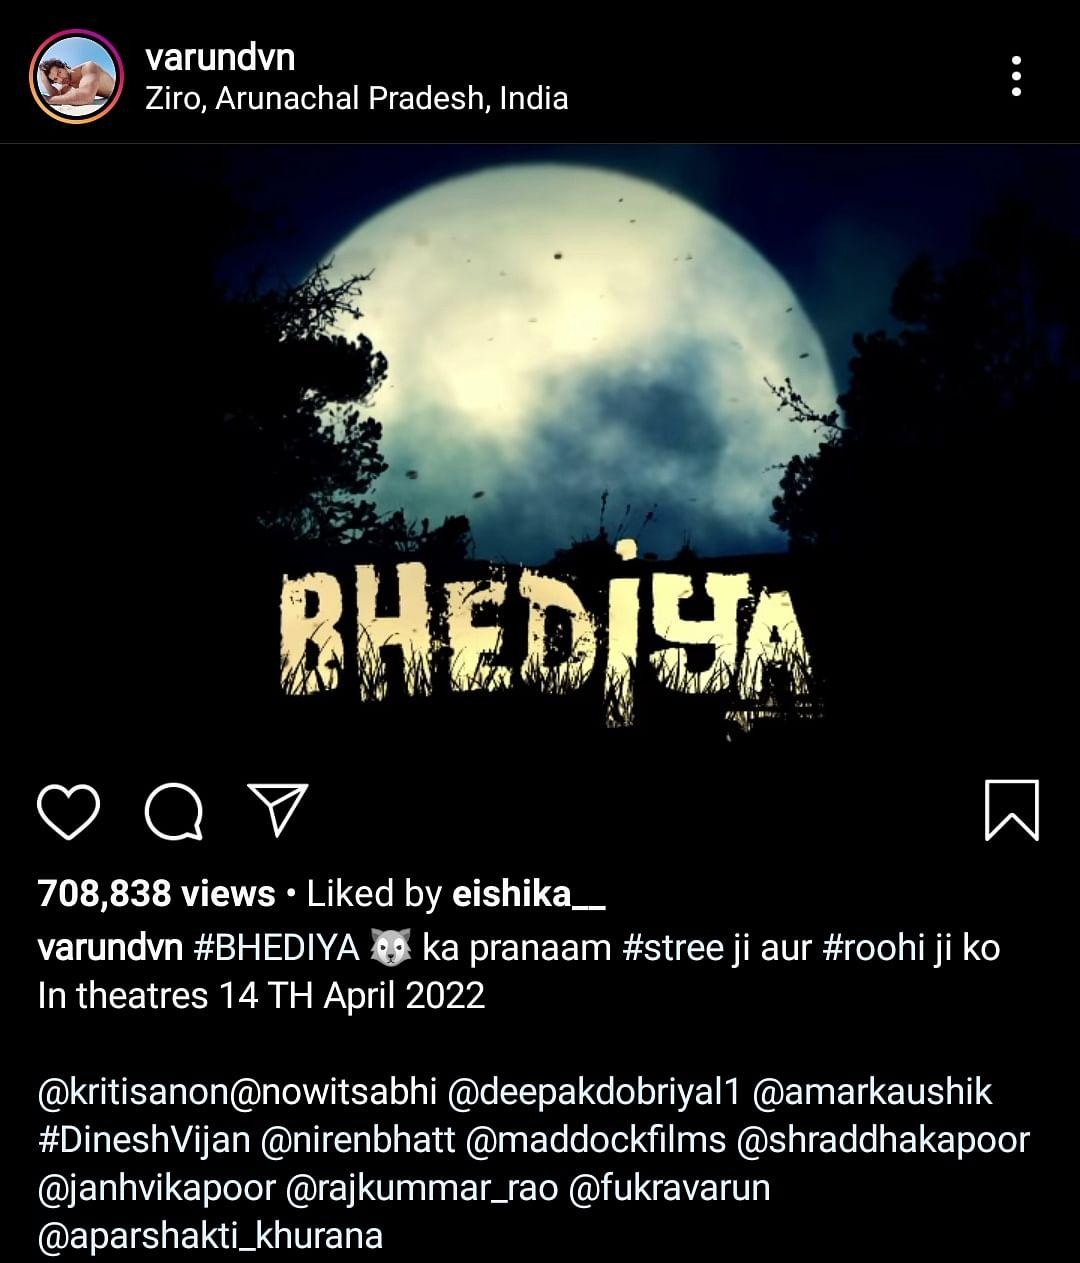 Varun Dhawan, Kriti Sanon Join the Horror Universe With Bhediya